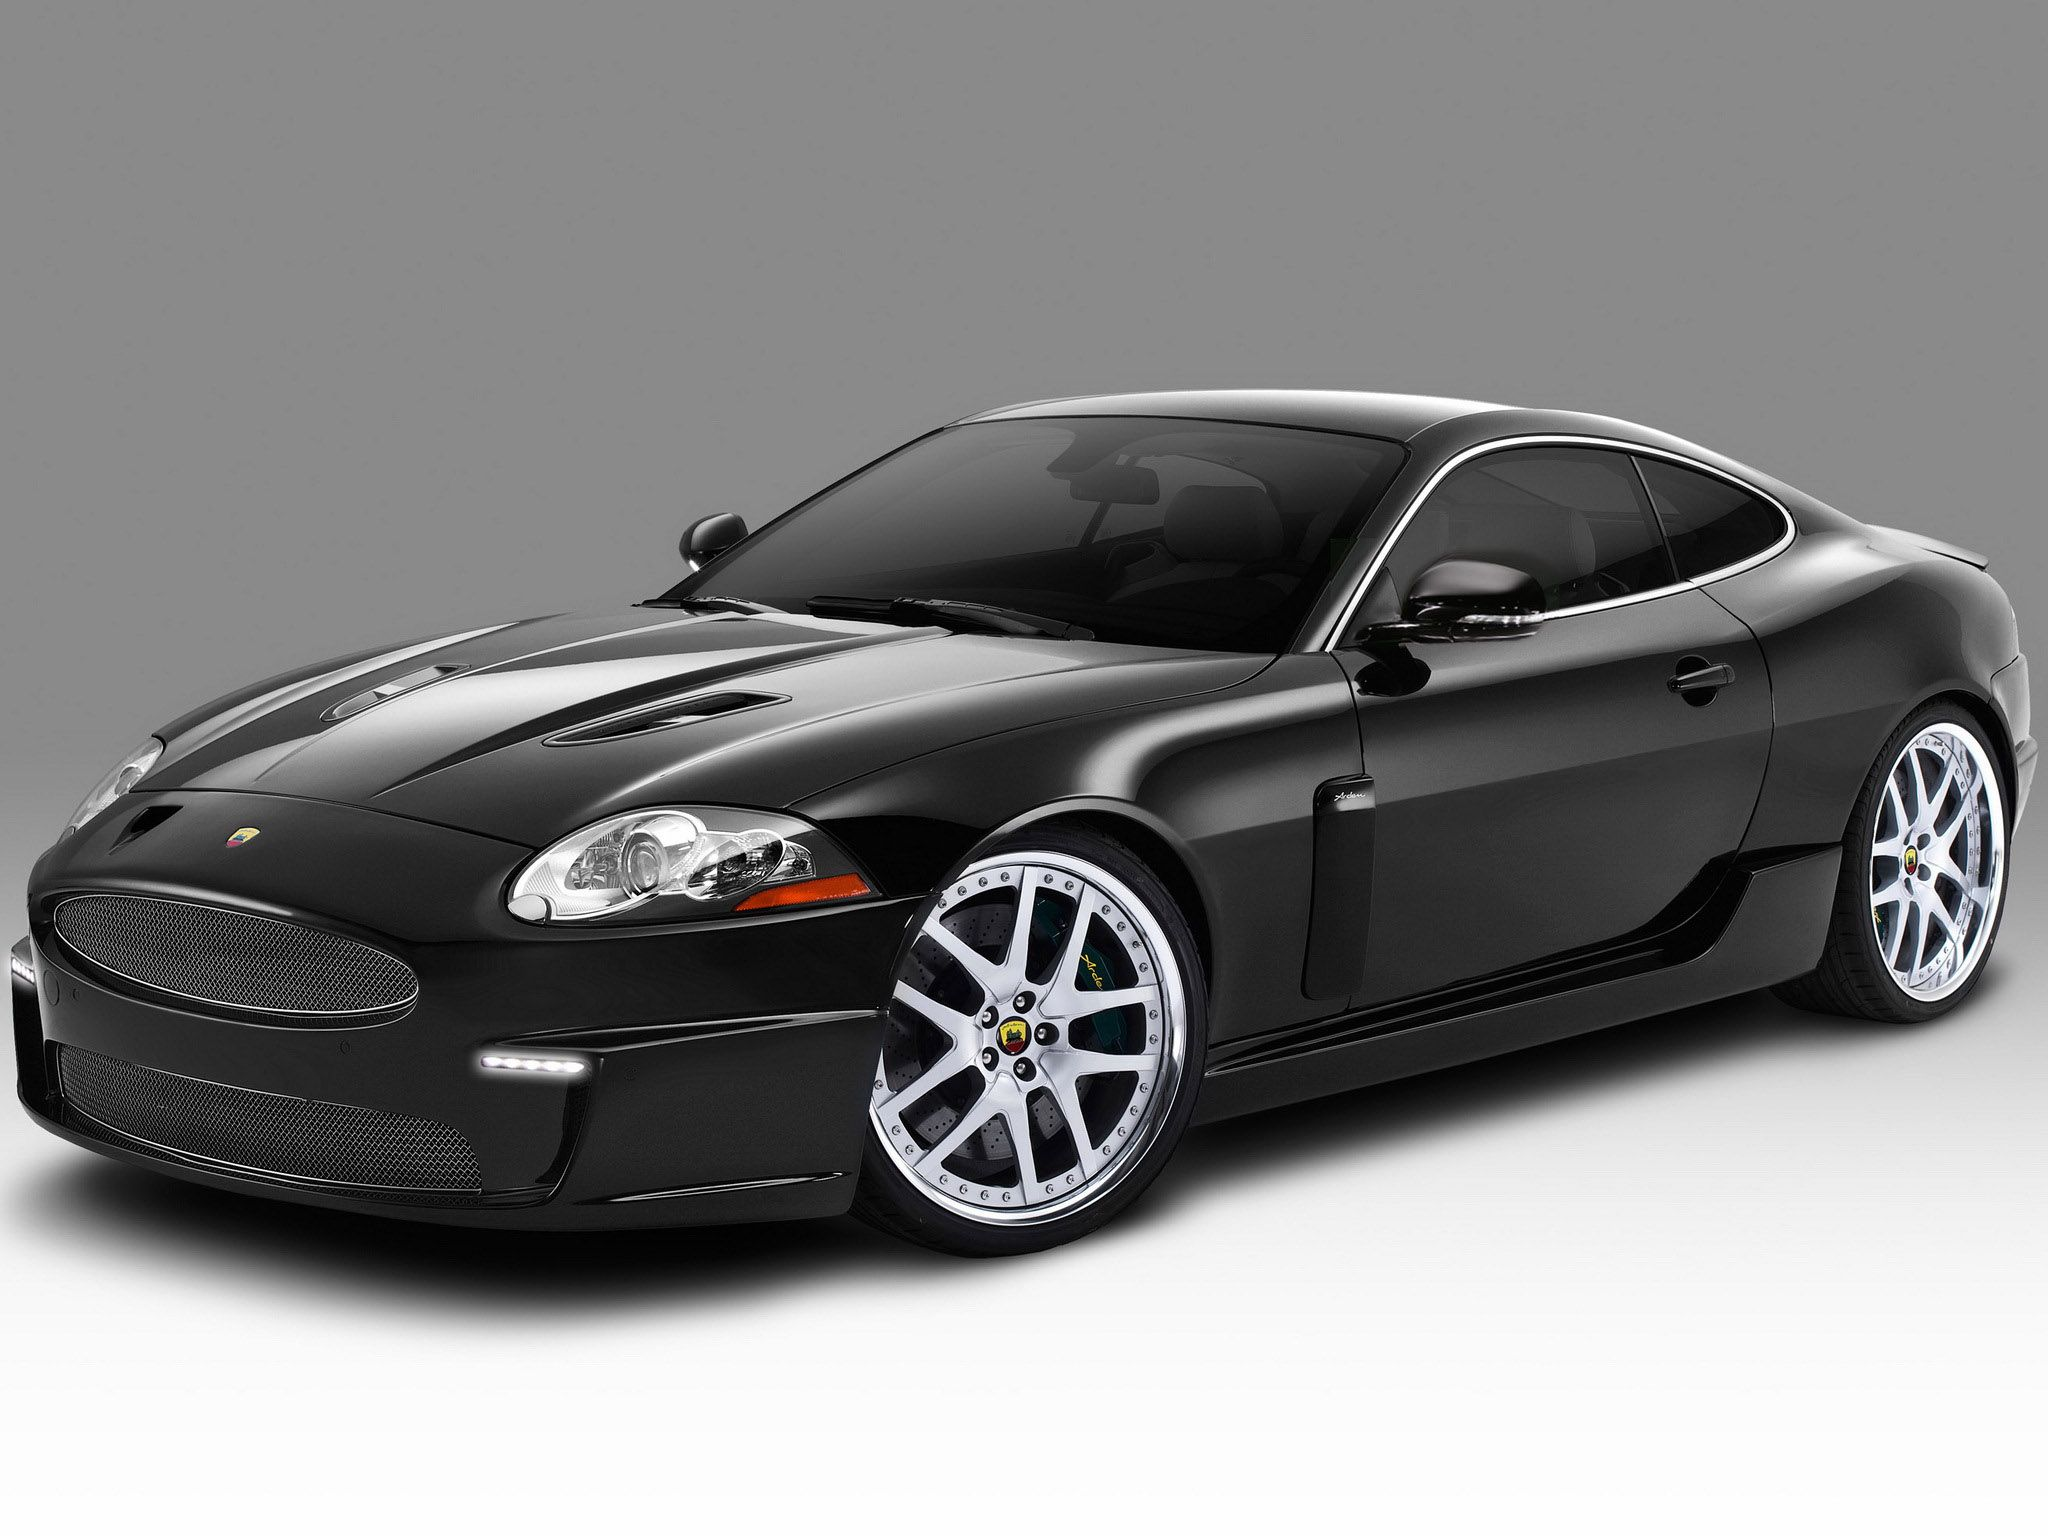 Jag Xkr Jaguar Cars Pinterest Jaguar Cars And Jaguar Xk